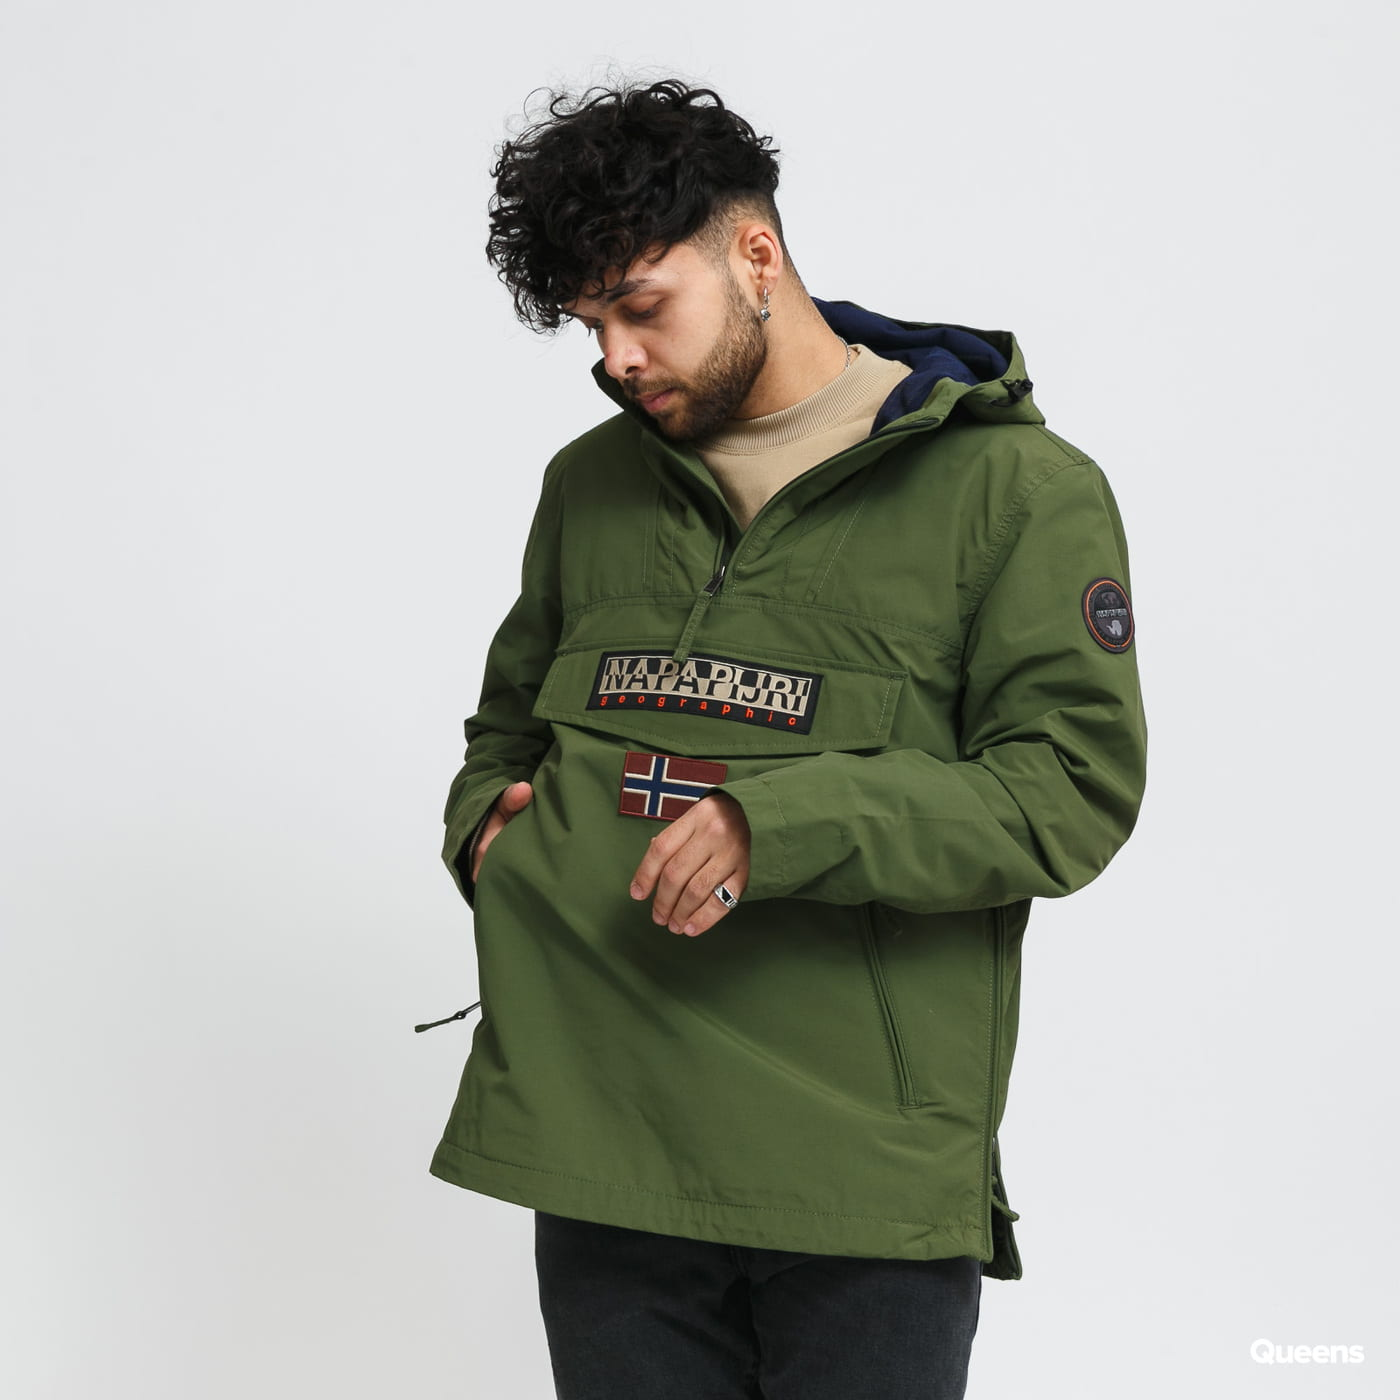 NAPAPIJRI Rainforest S Pocket 2 Jacket olive